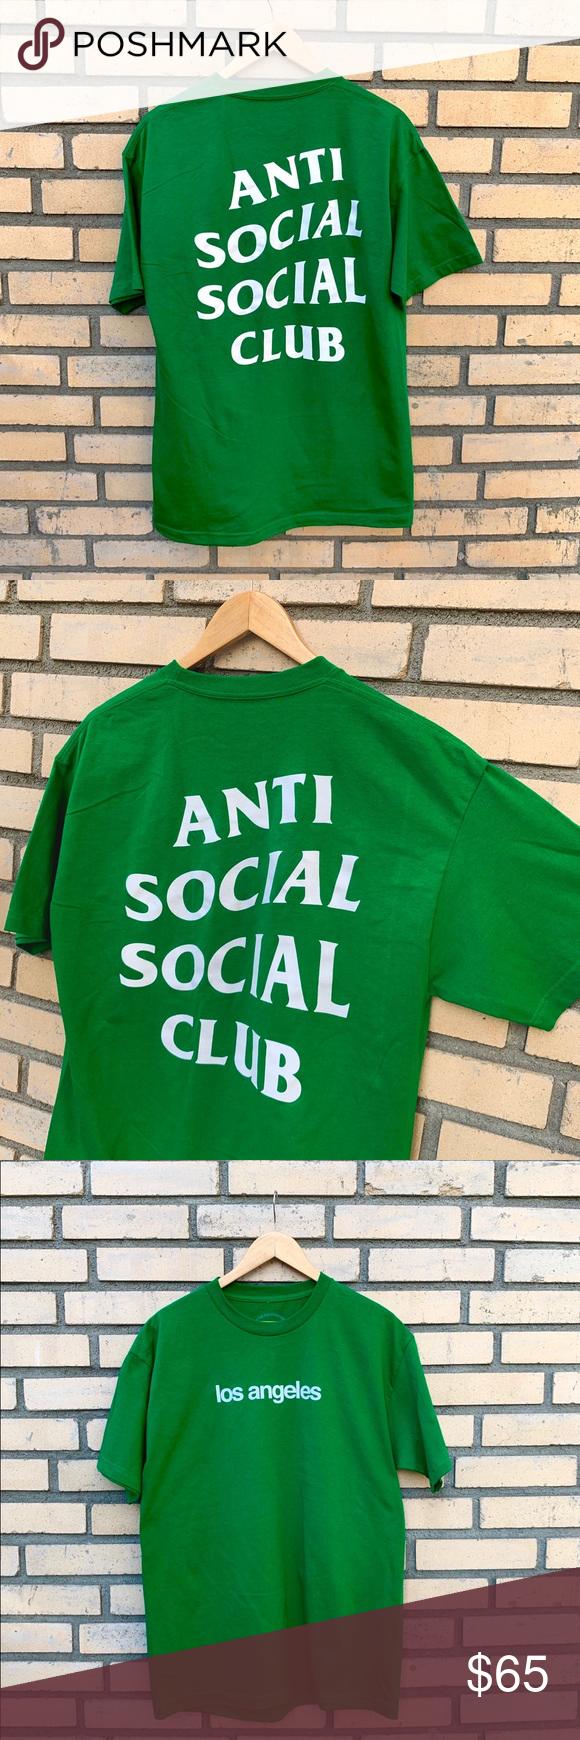 Assc Los Angeles 2019 T Shirt Anti Social Social Club Anti Social Shirts